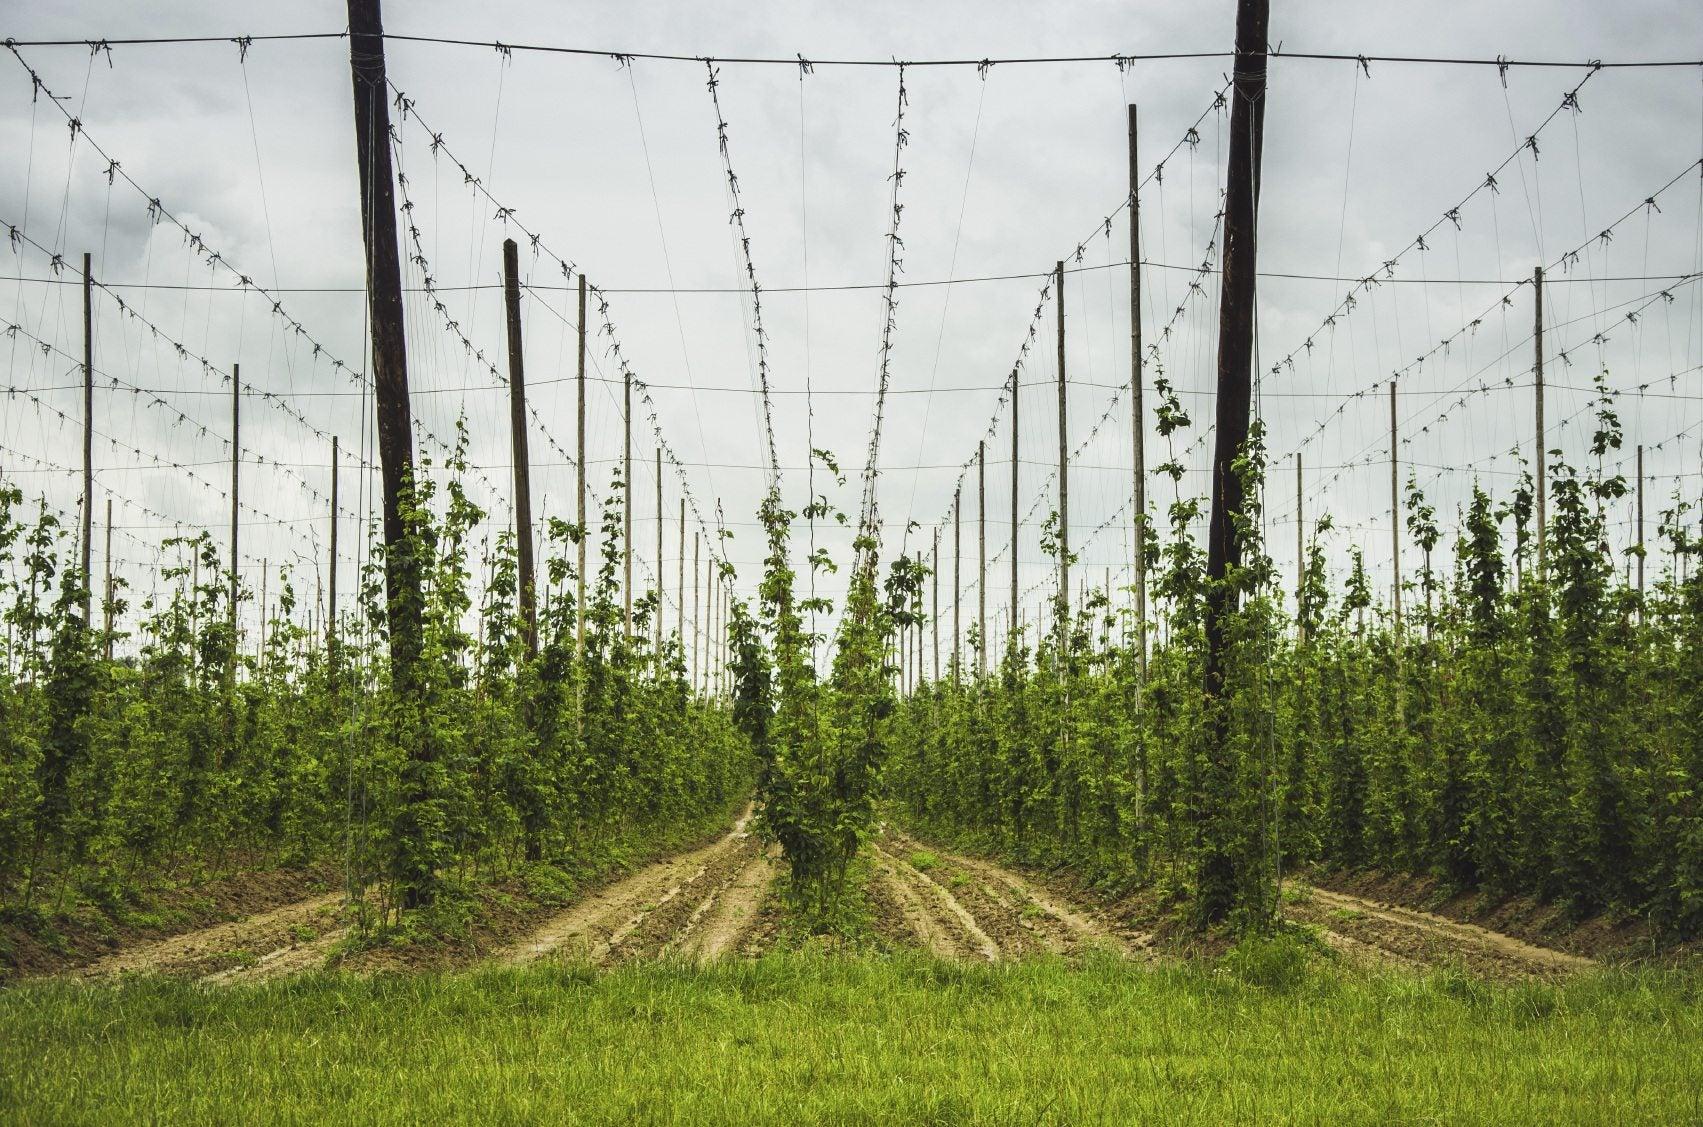 Best support for hops plant tips on building a trellis for Hops garden designs